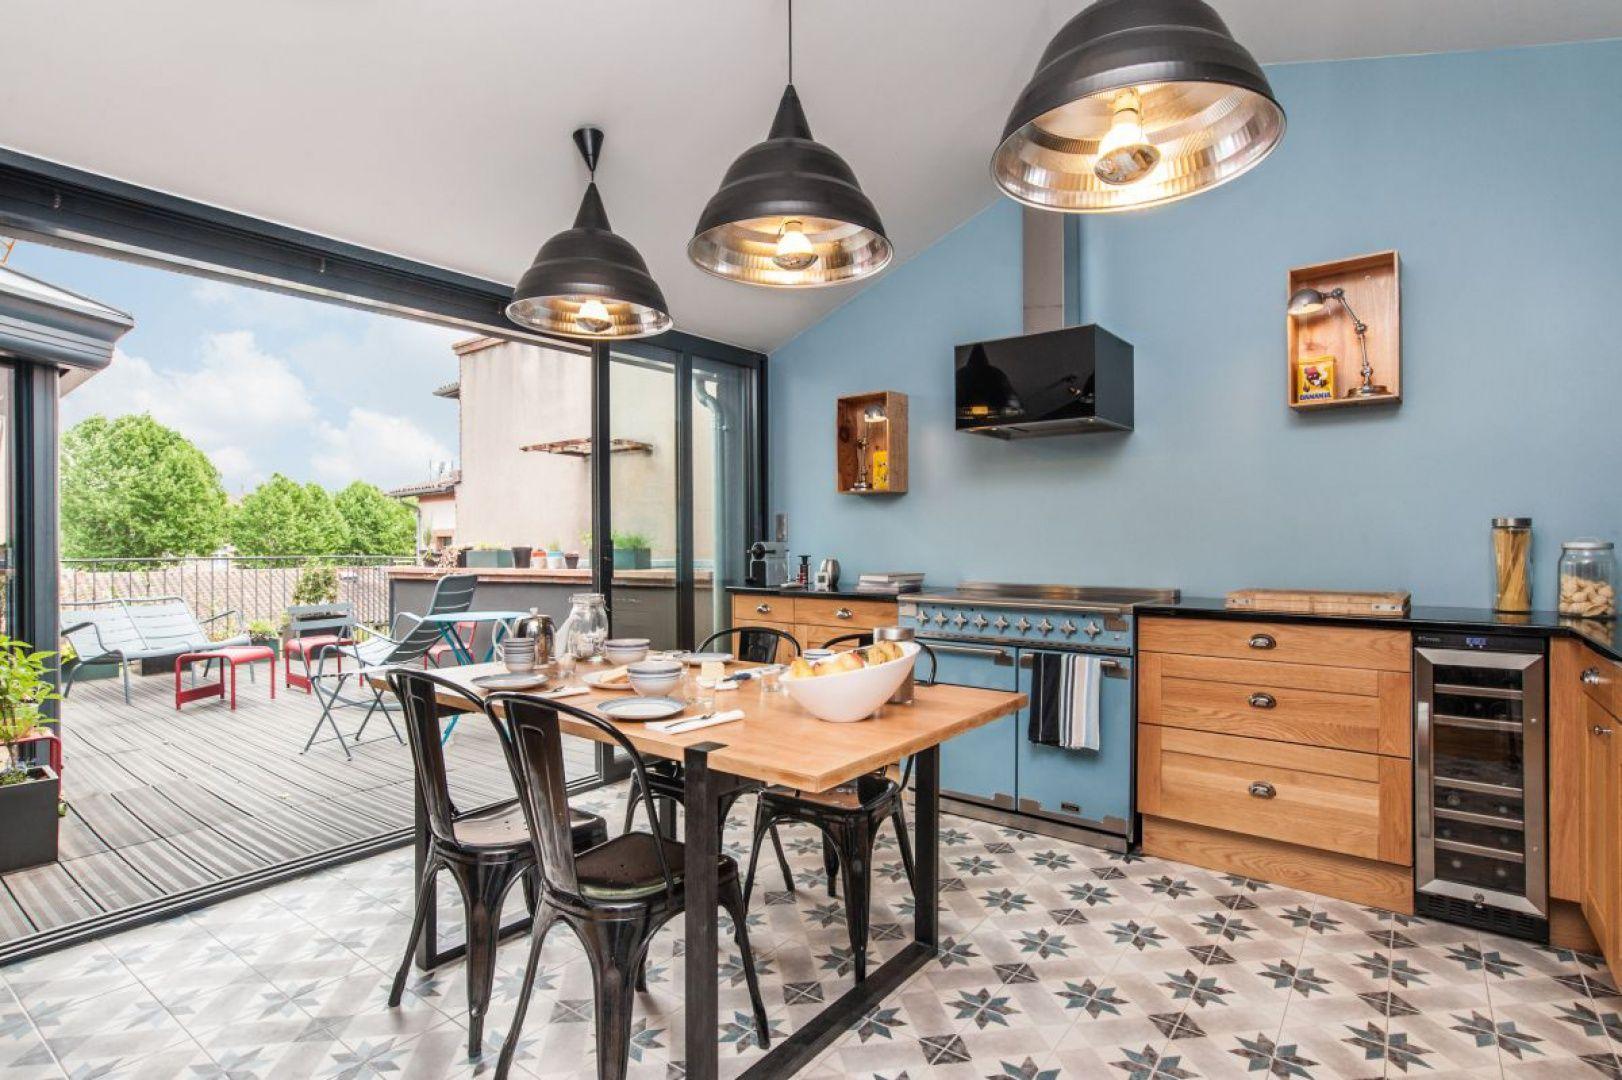 Kuchnia Elise To Klasyczne Wzornictwo Oraz Szalony Kolor China Blue Idealny Do Kuchni W Stylu Lat 50 I 60 Fot Falcon Home Remodeling Home Home Decor